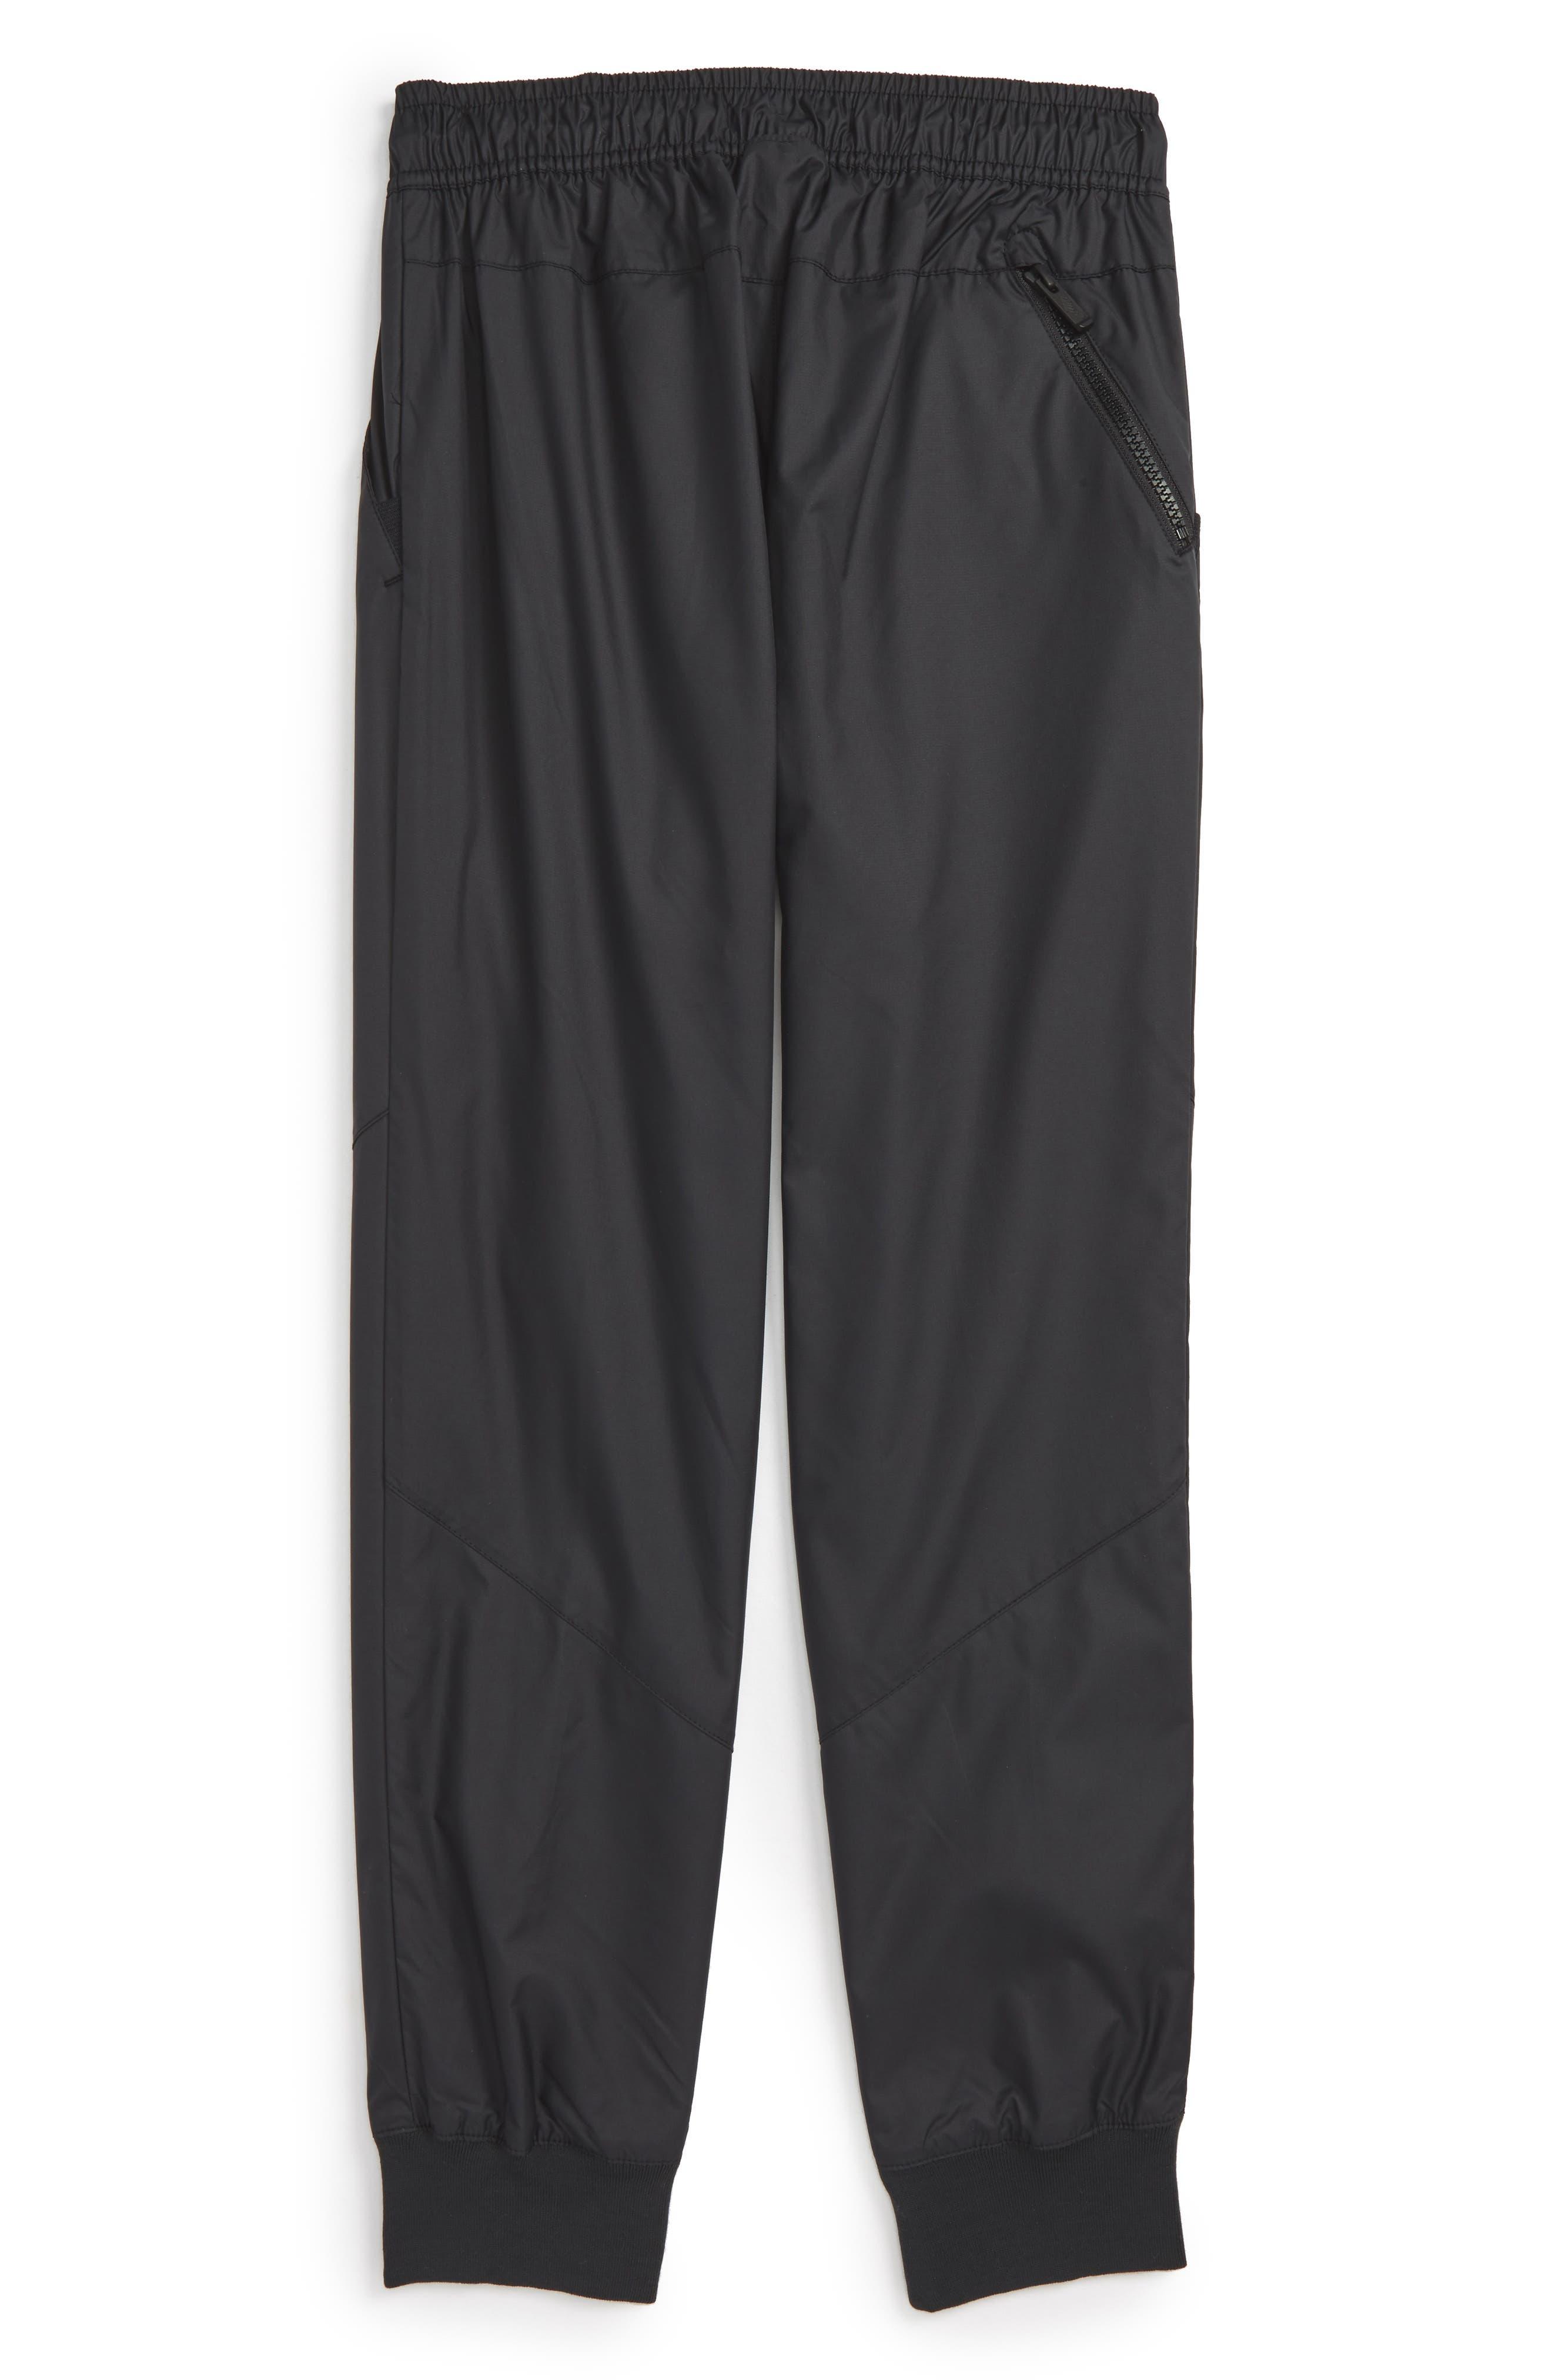 Alternate Image 2  - Nike Sportswear Water Resistant Pants (Little Boys & Big Boys)